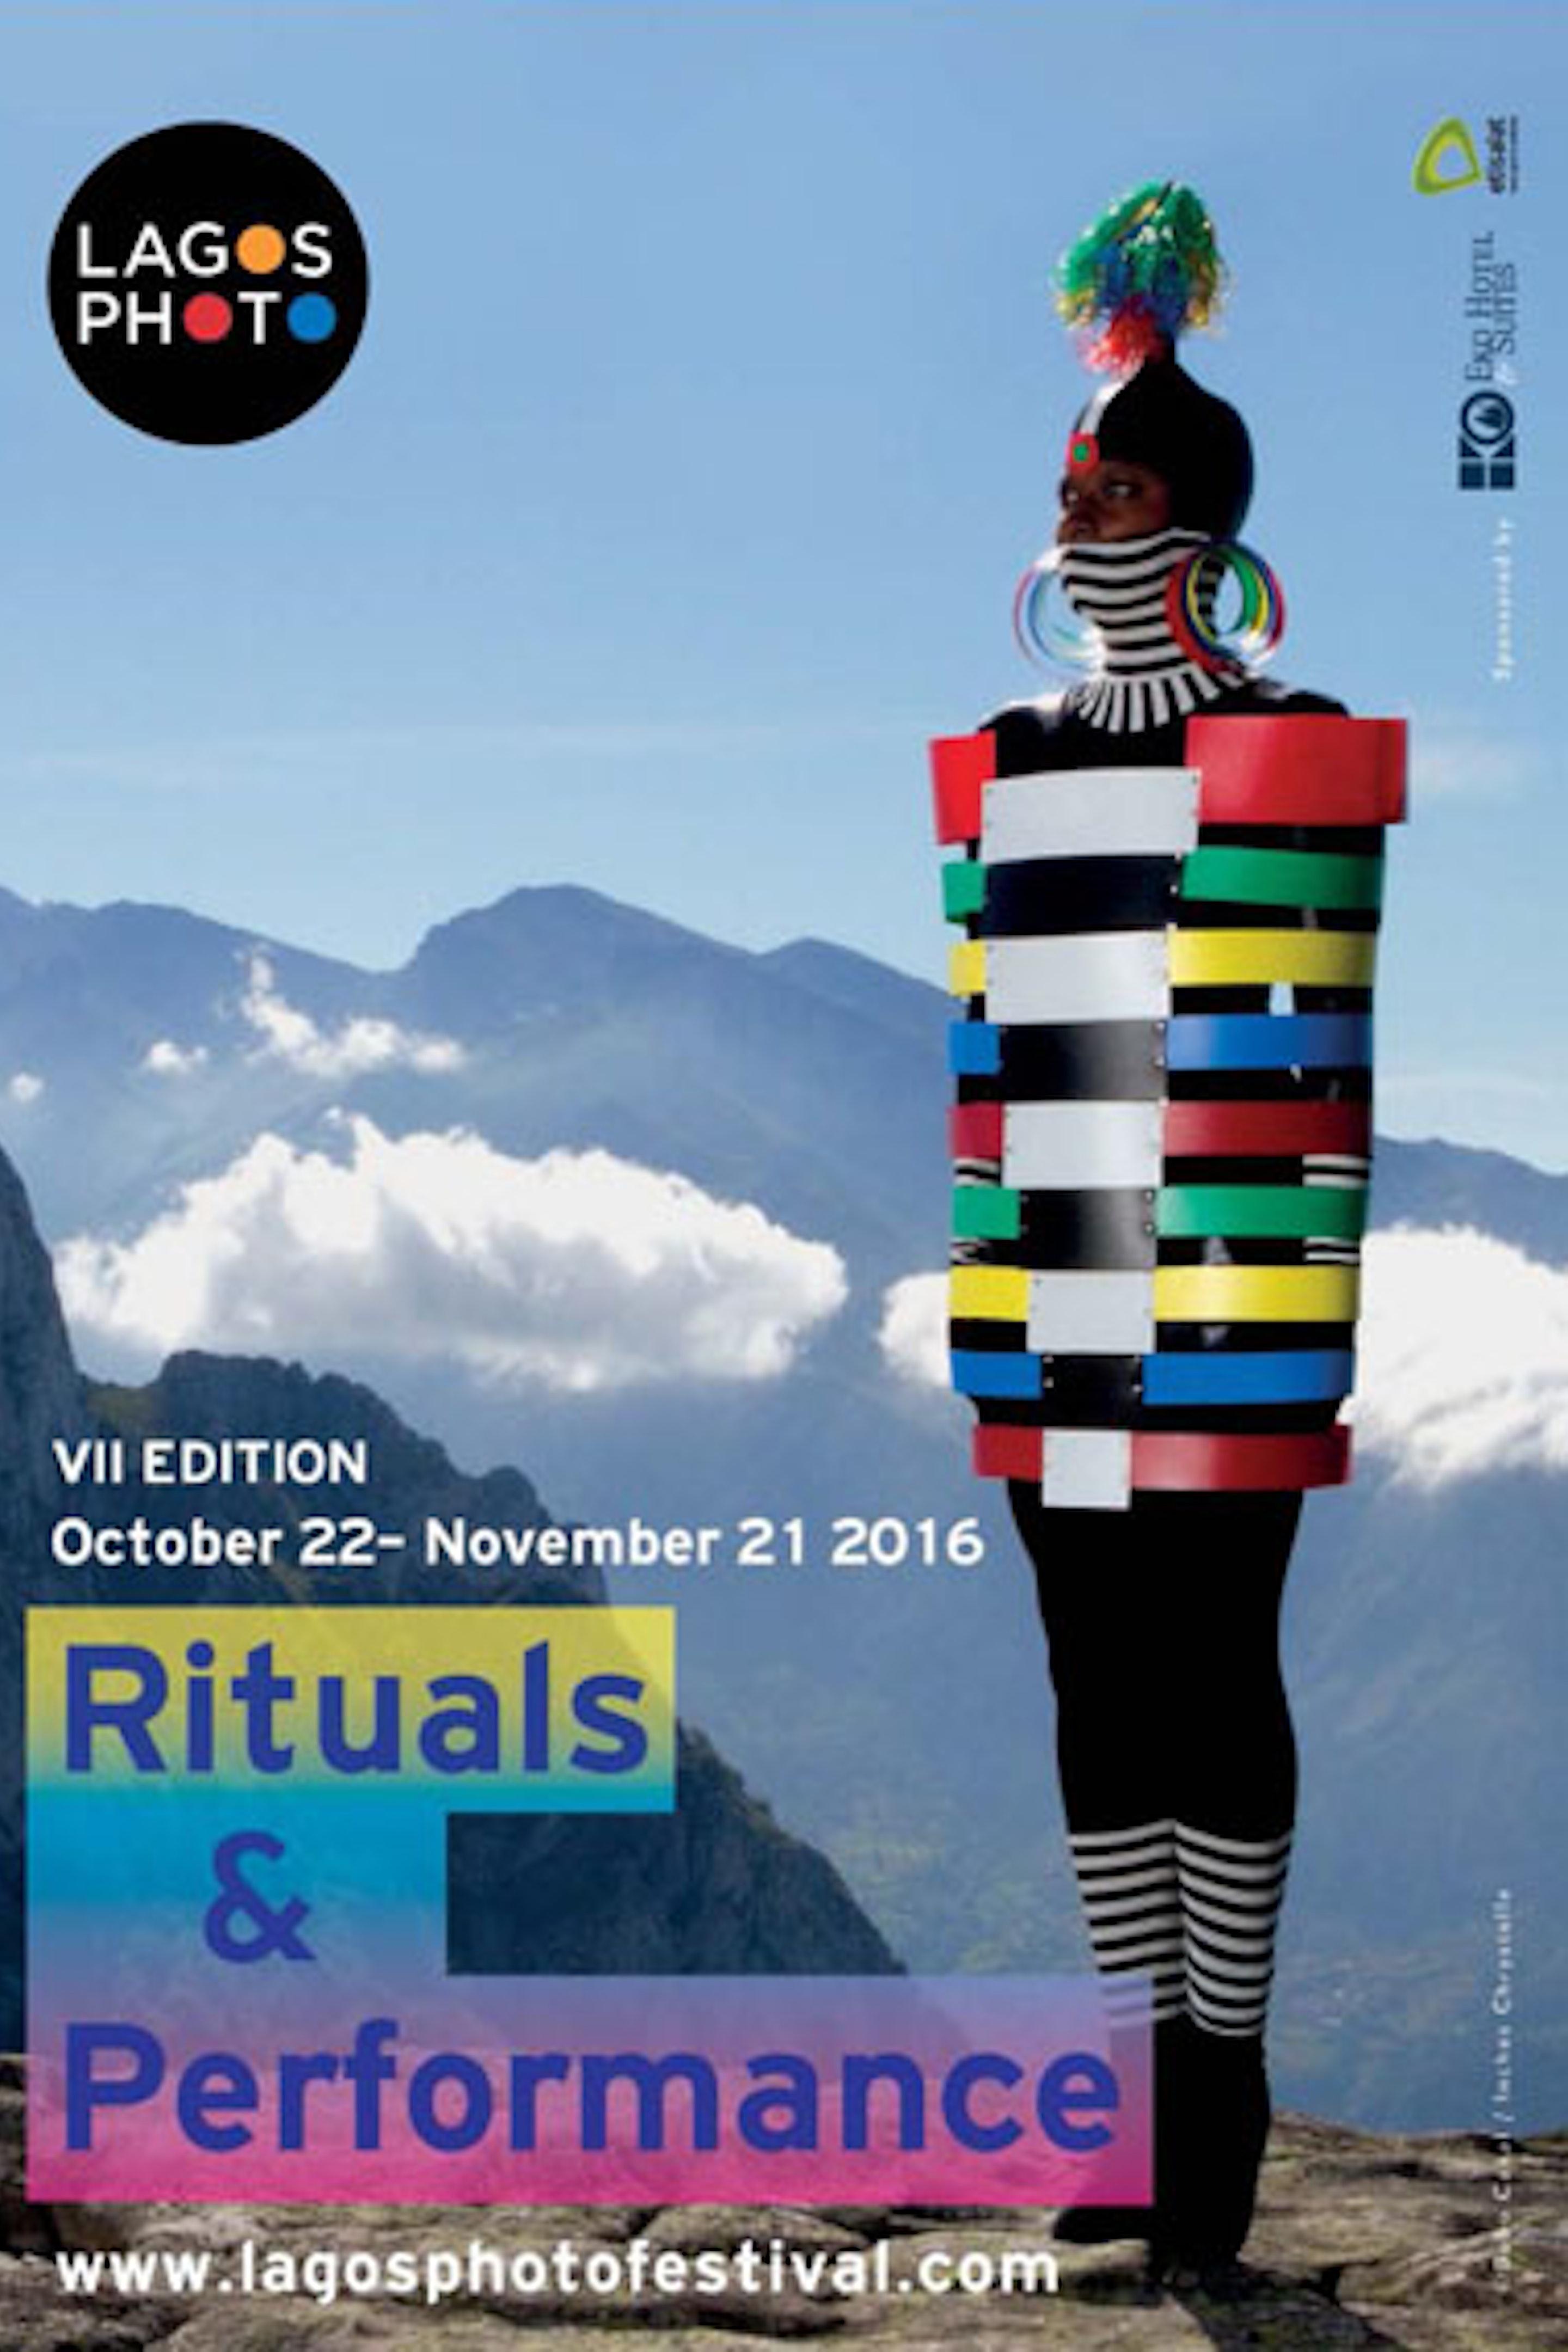 LAGOS PHOTO: Rituals & Performance Exhibition